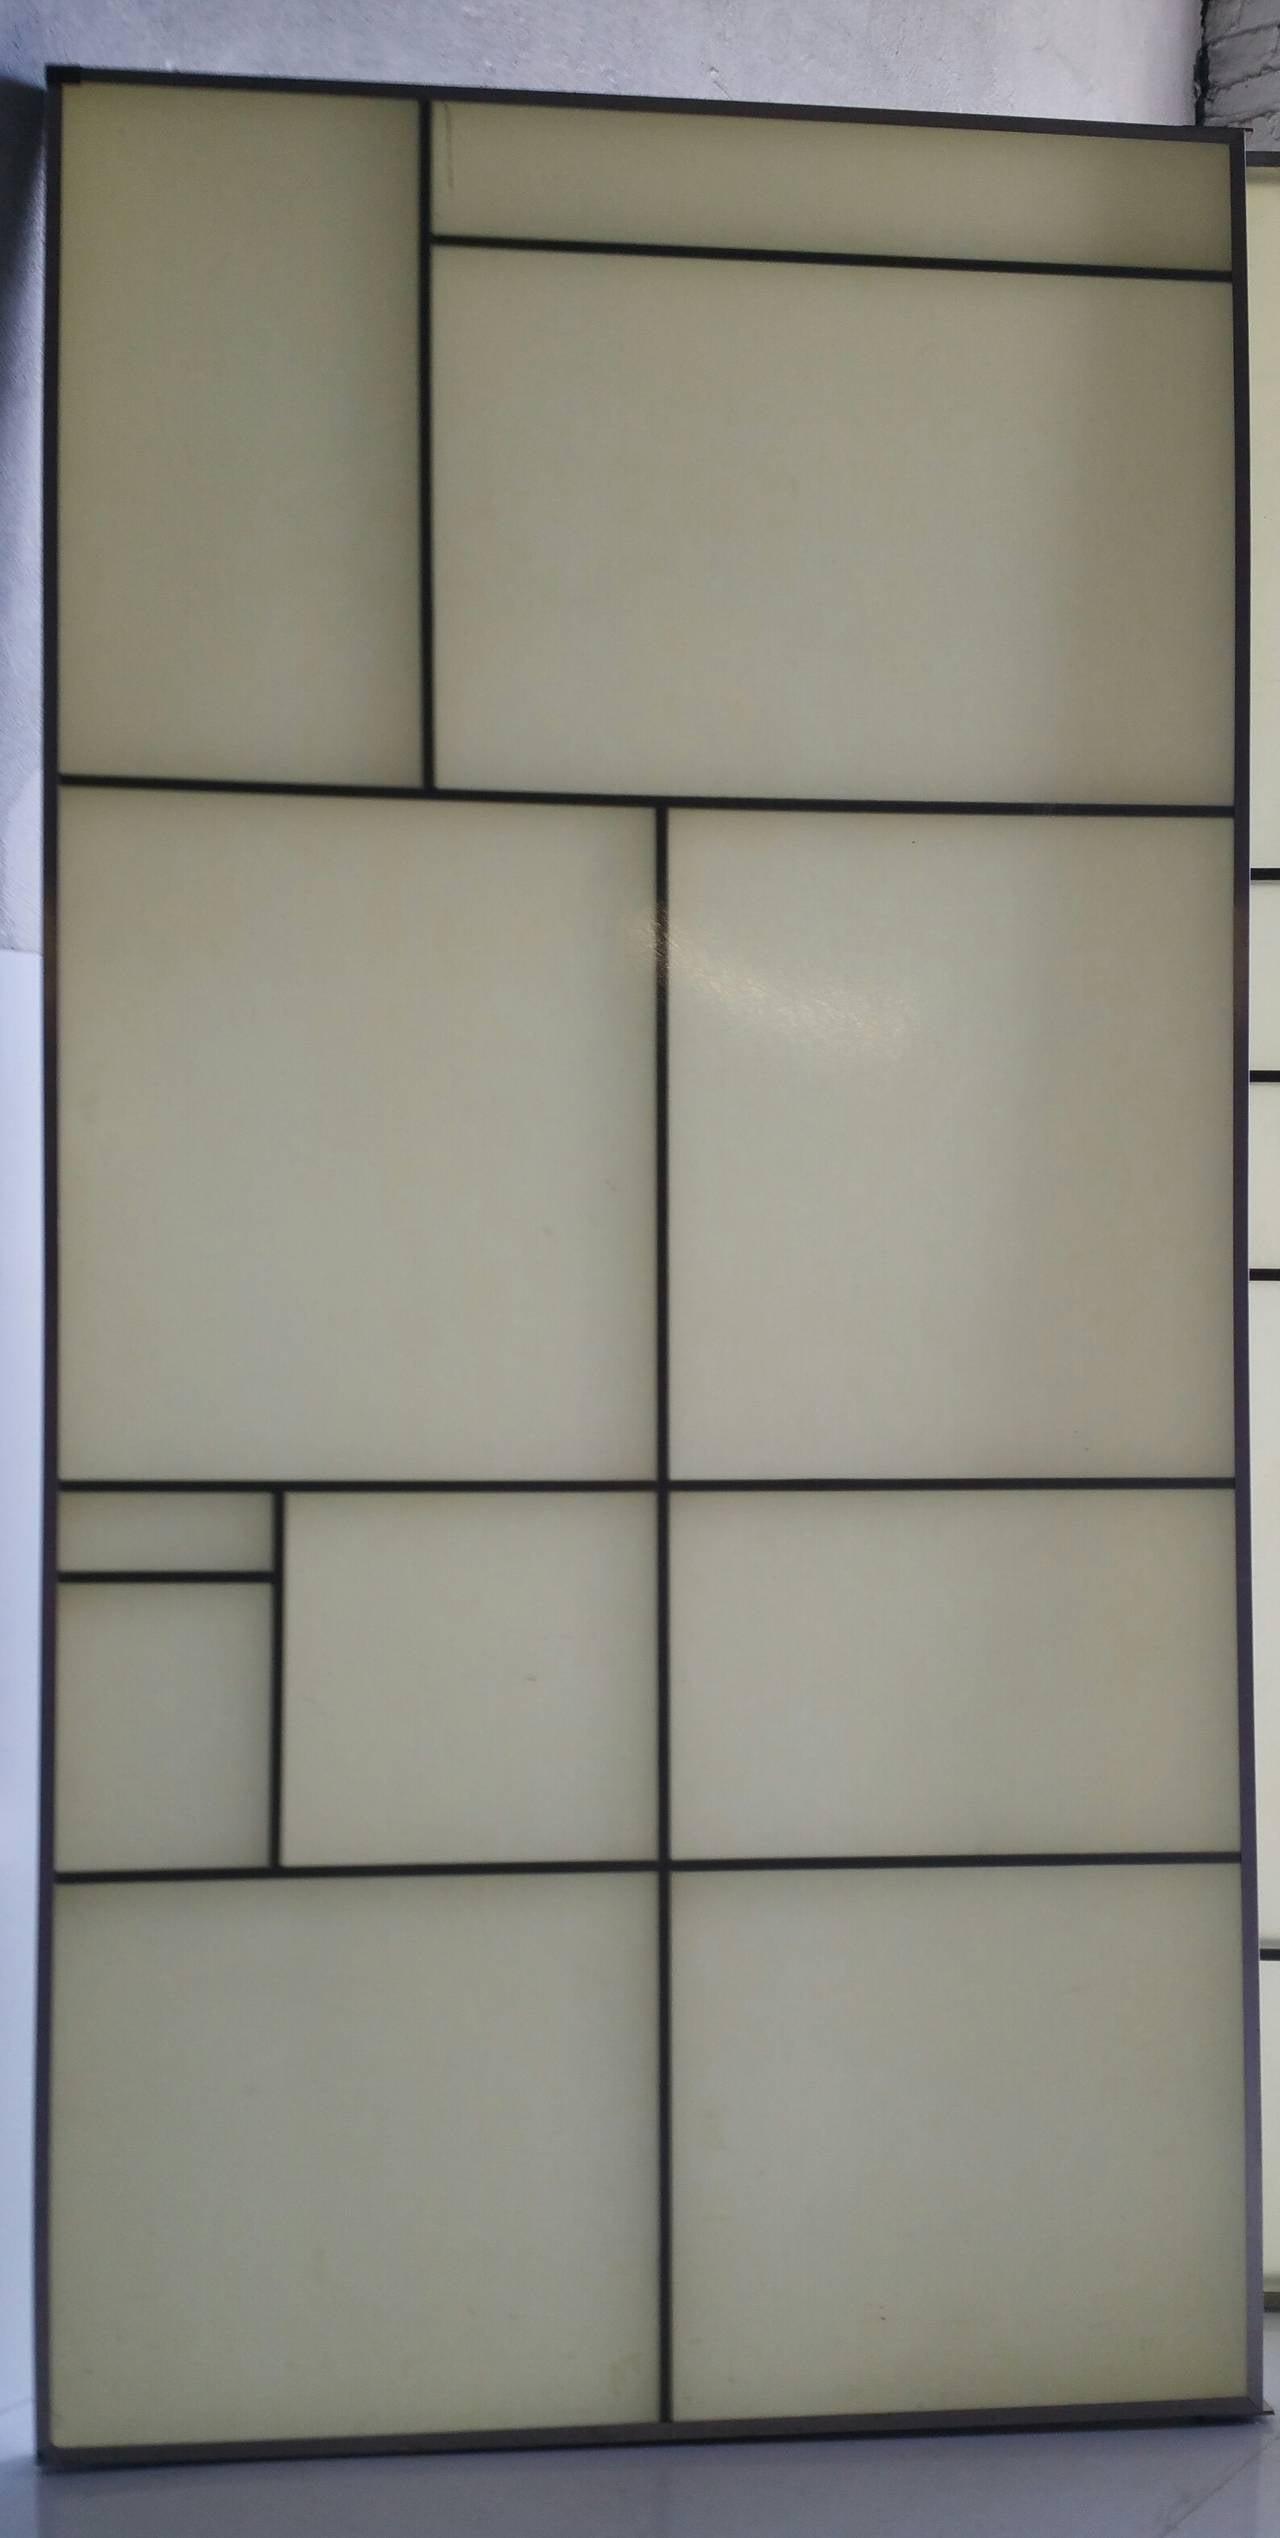 Architectural Aluminum And Fiberglass Panels Or Screen